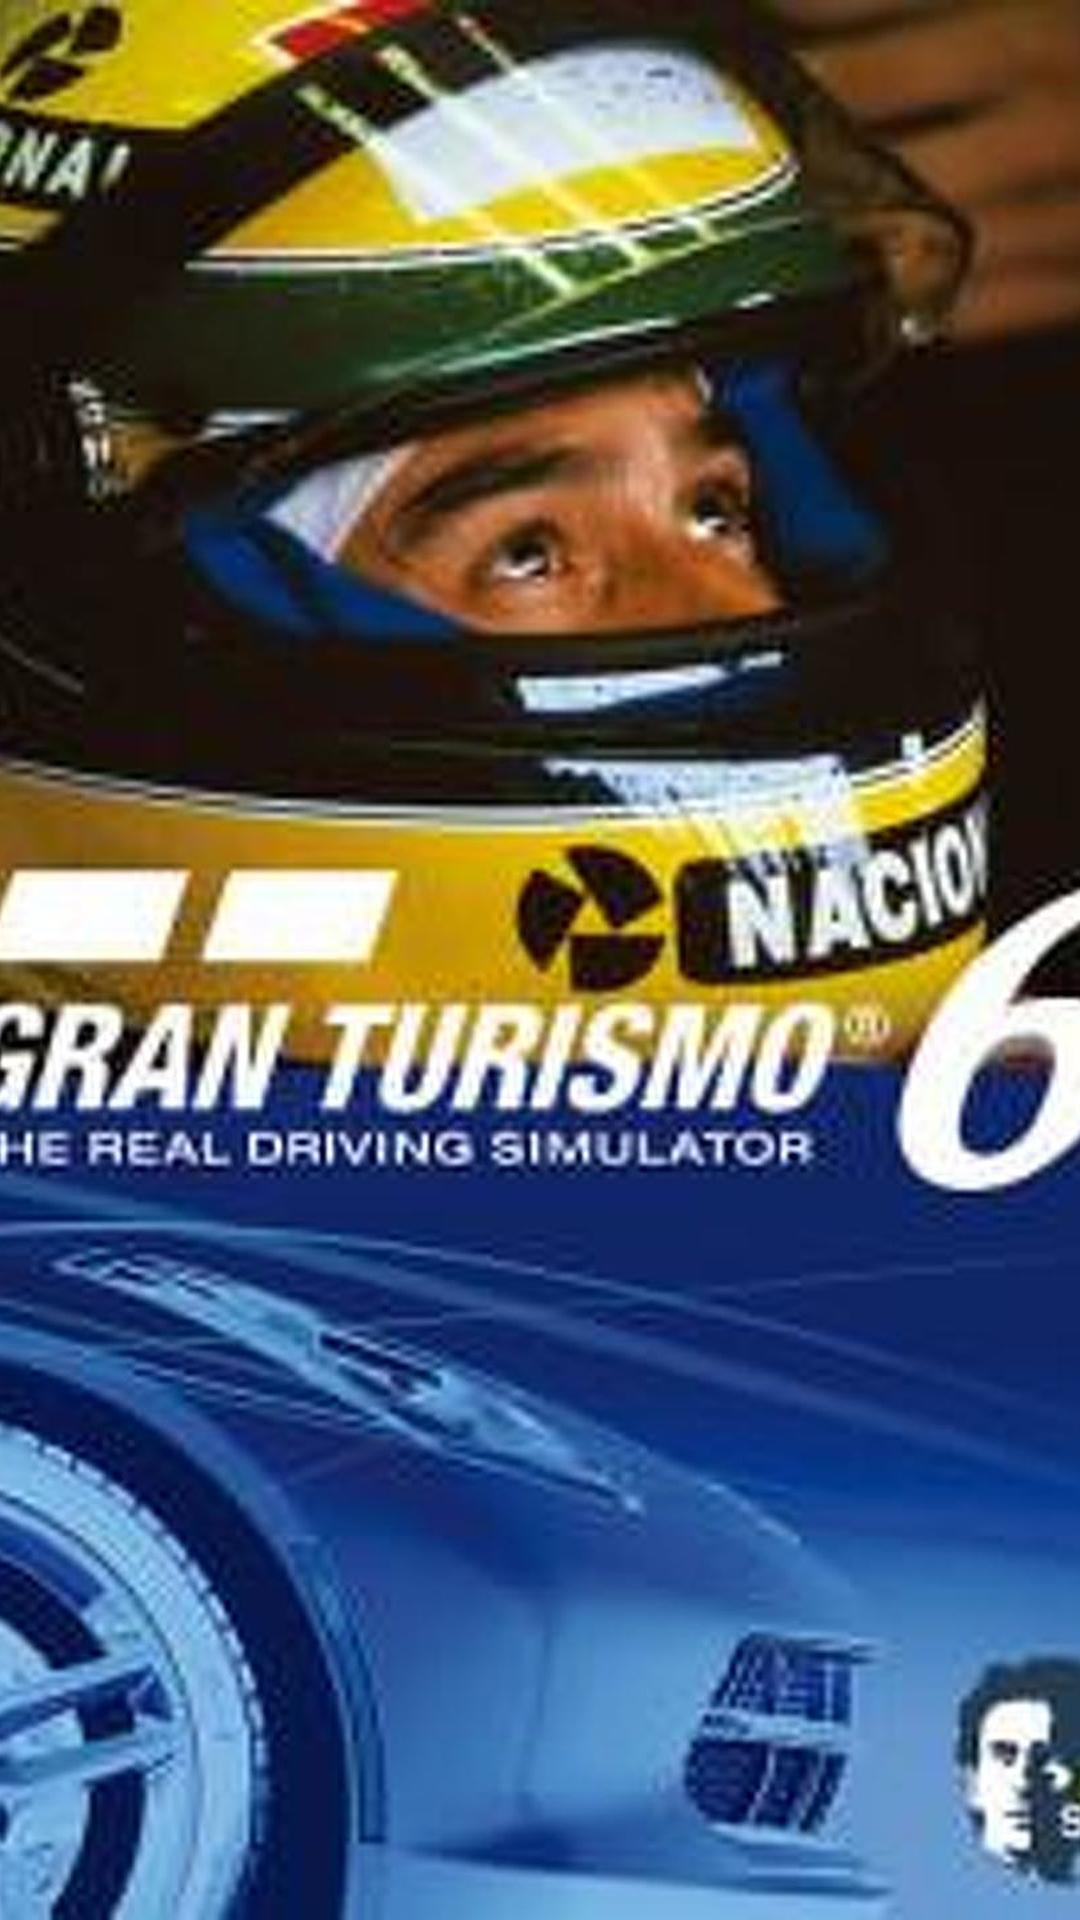 Gran Turismo 6 to include Ayrton Senna content